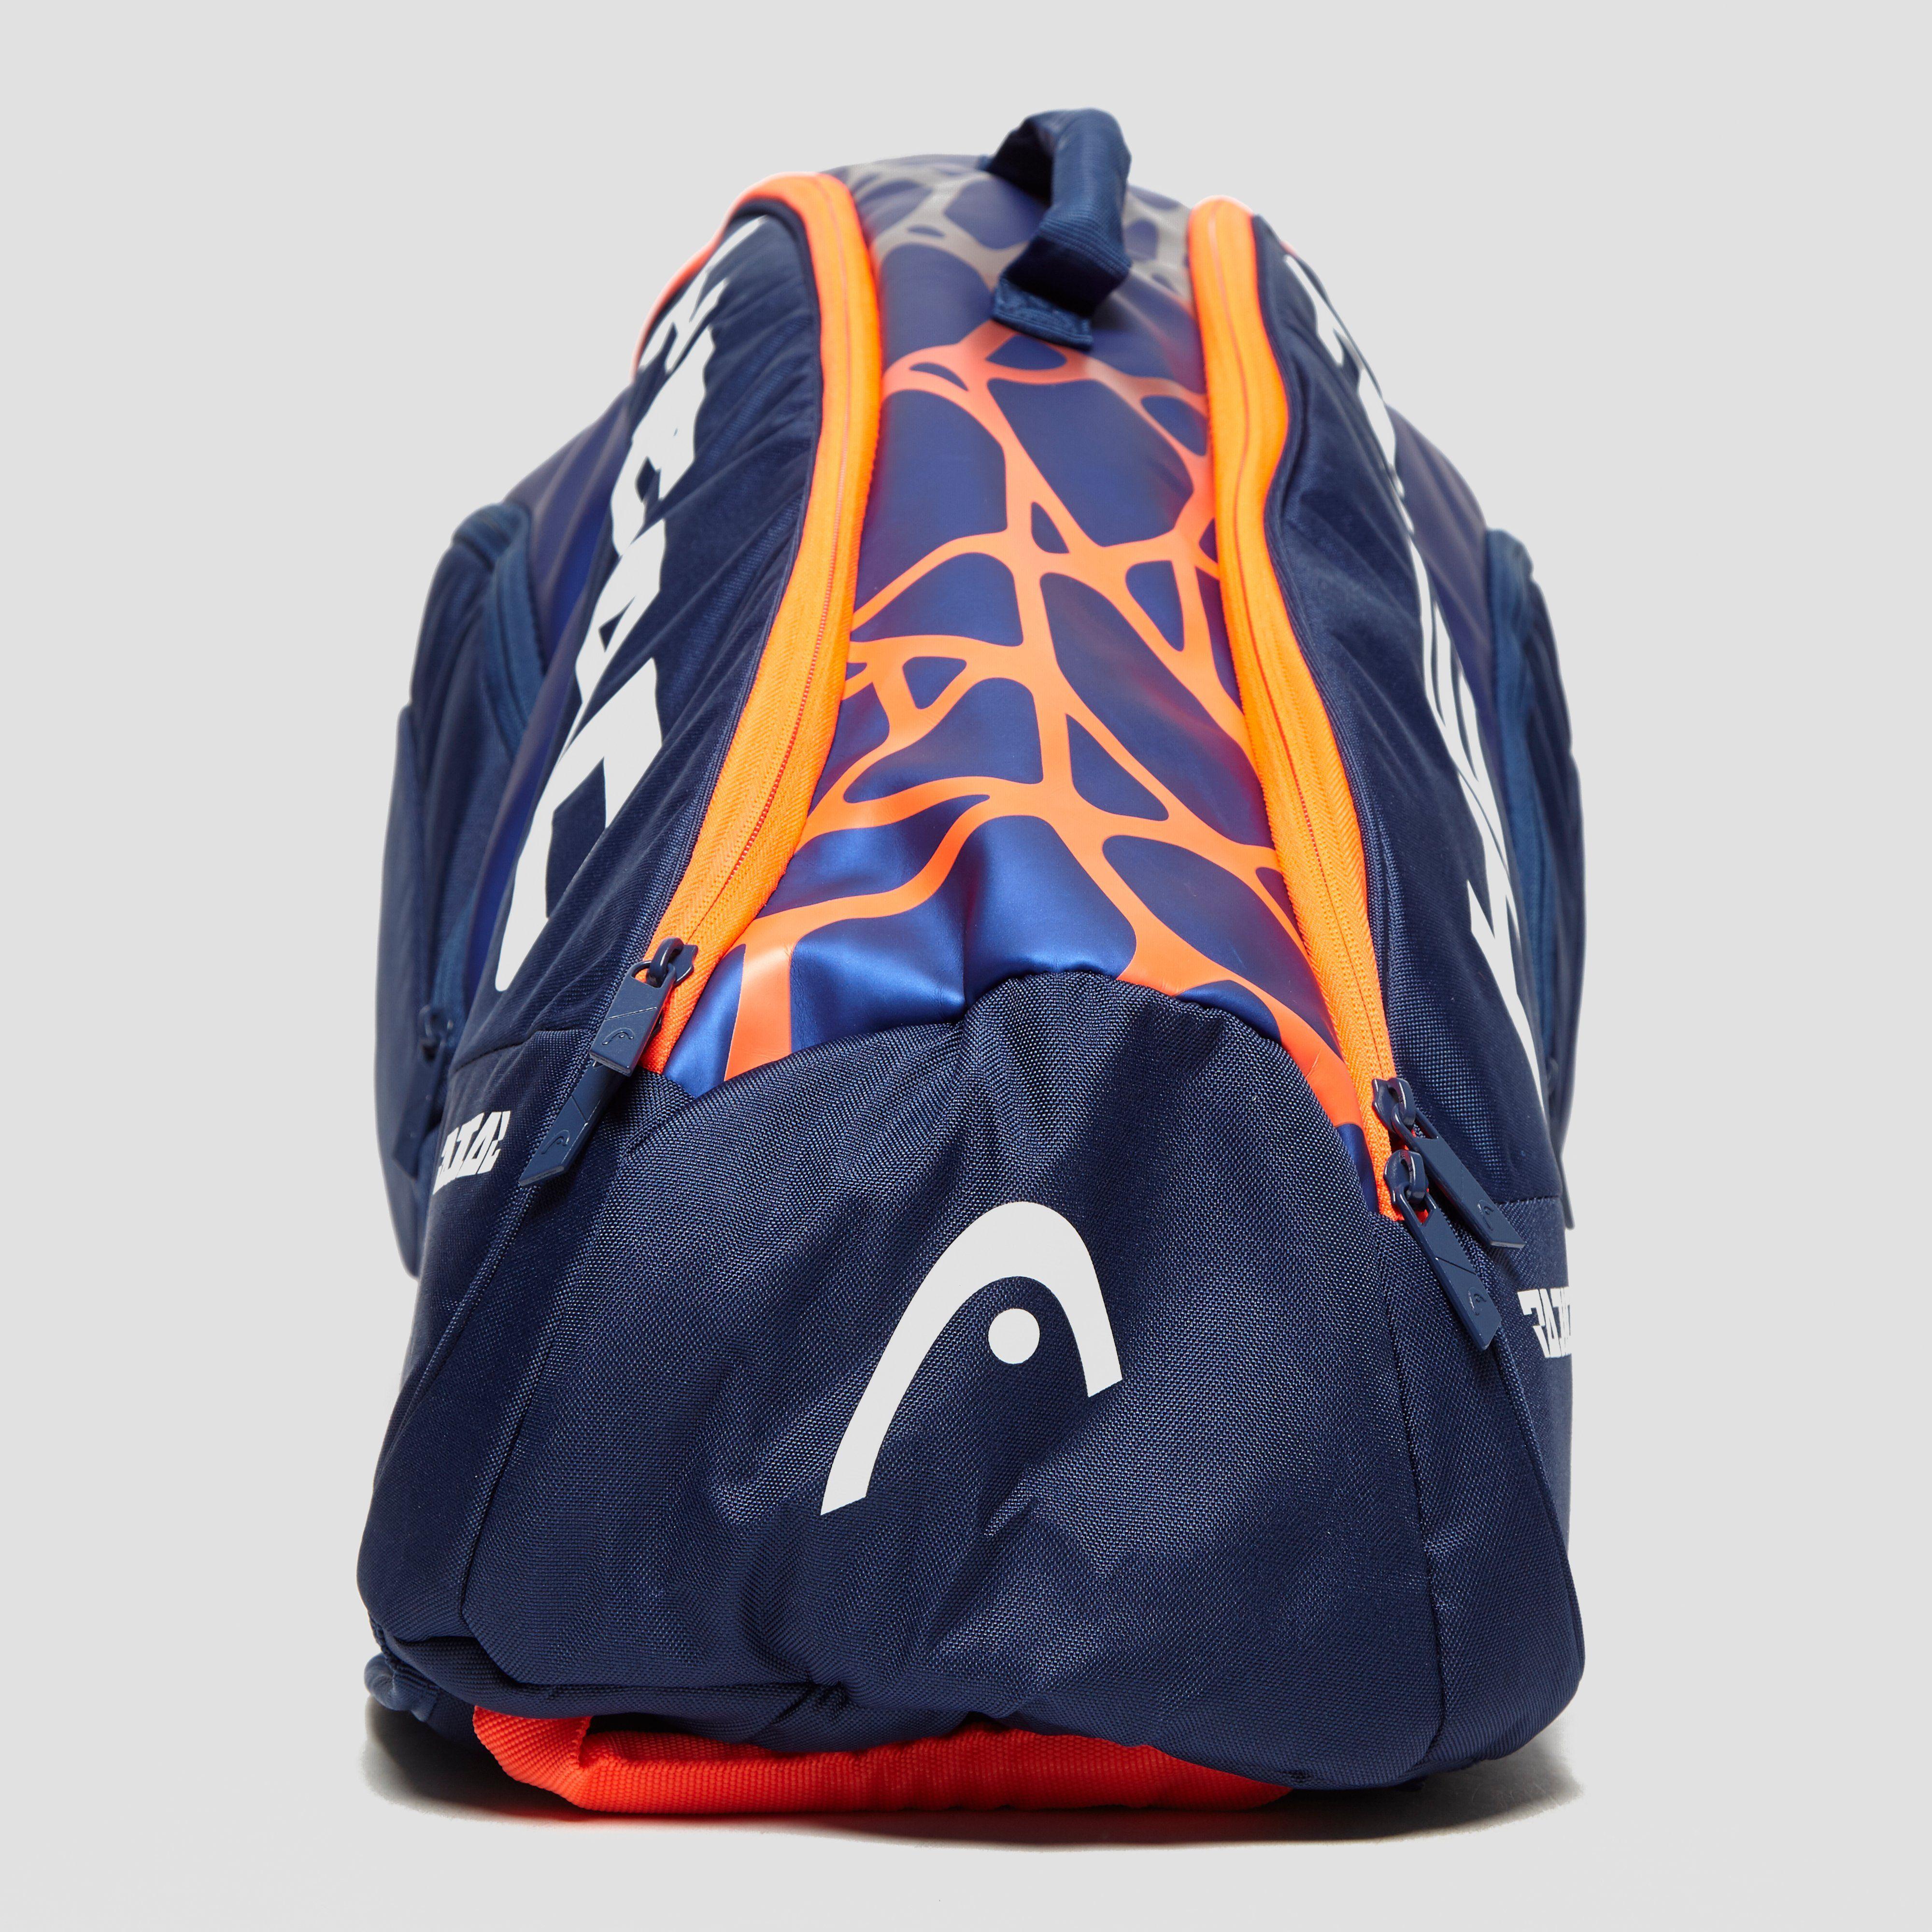 Head Radical Combi x6 Racket Bag